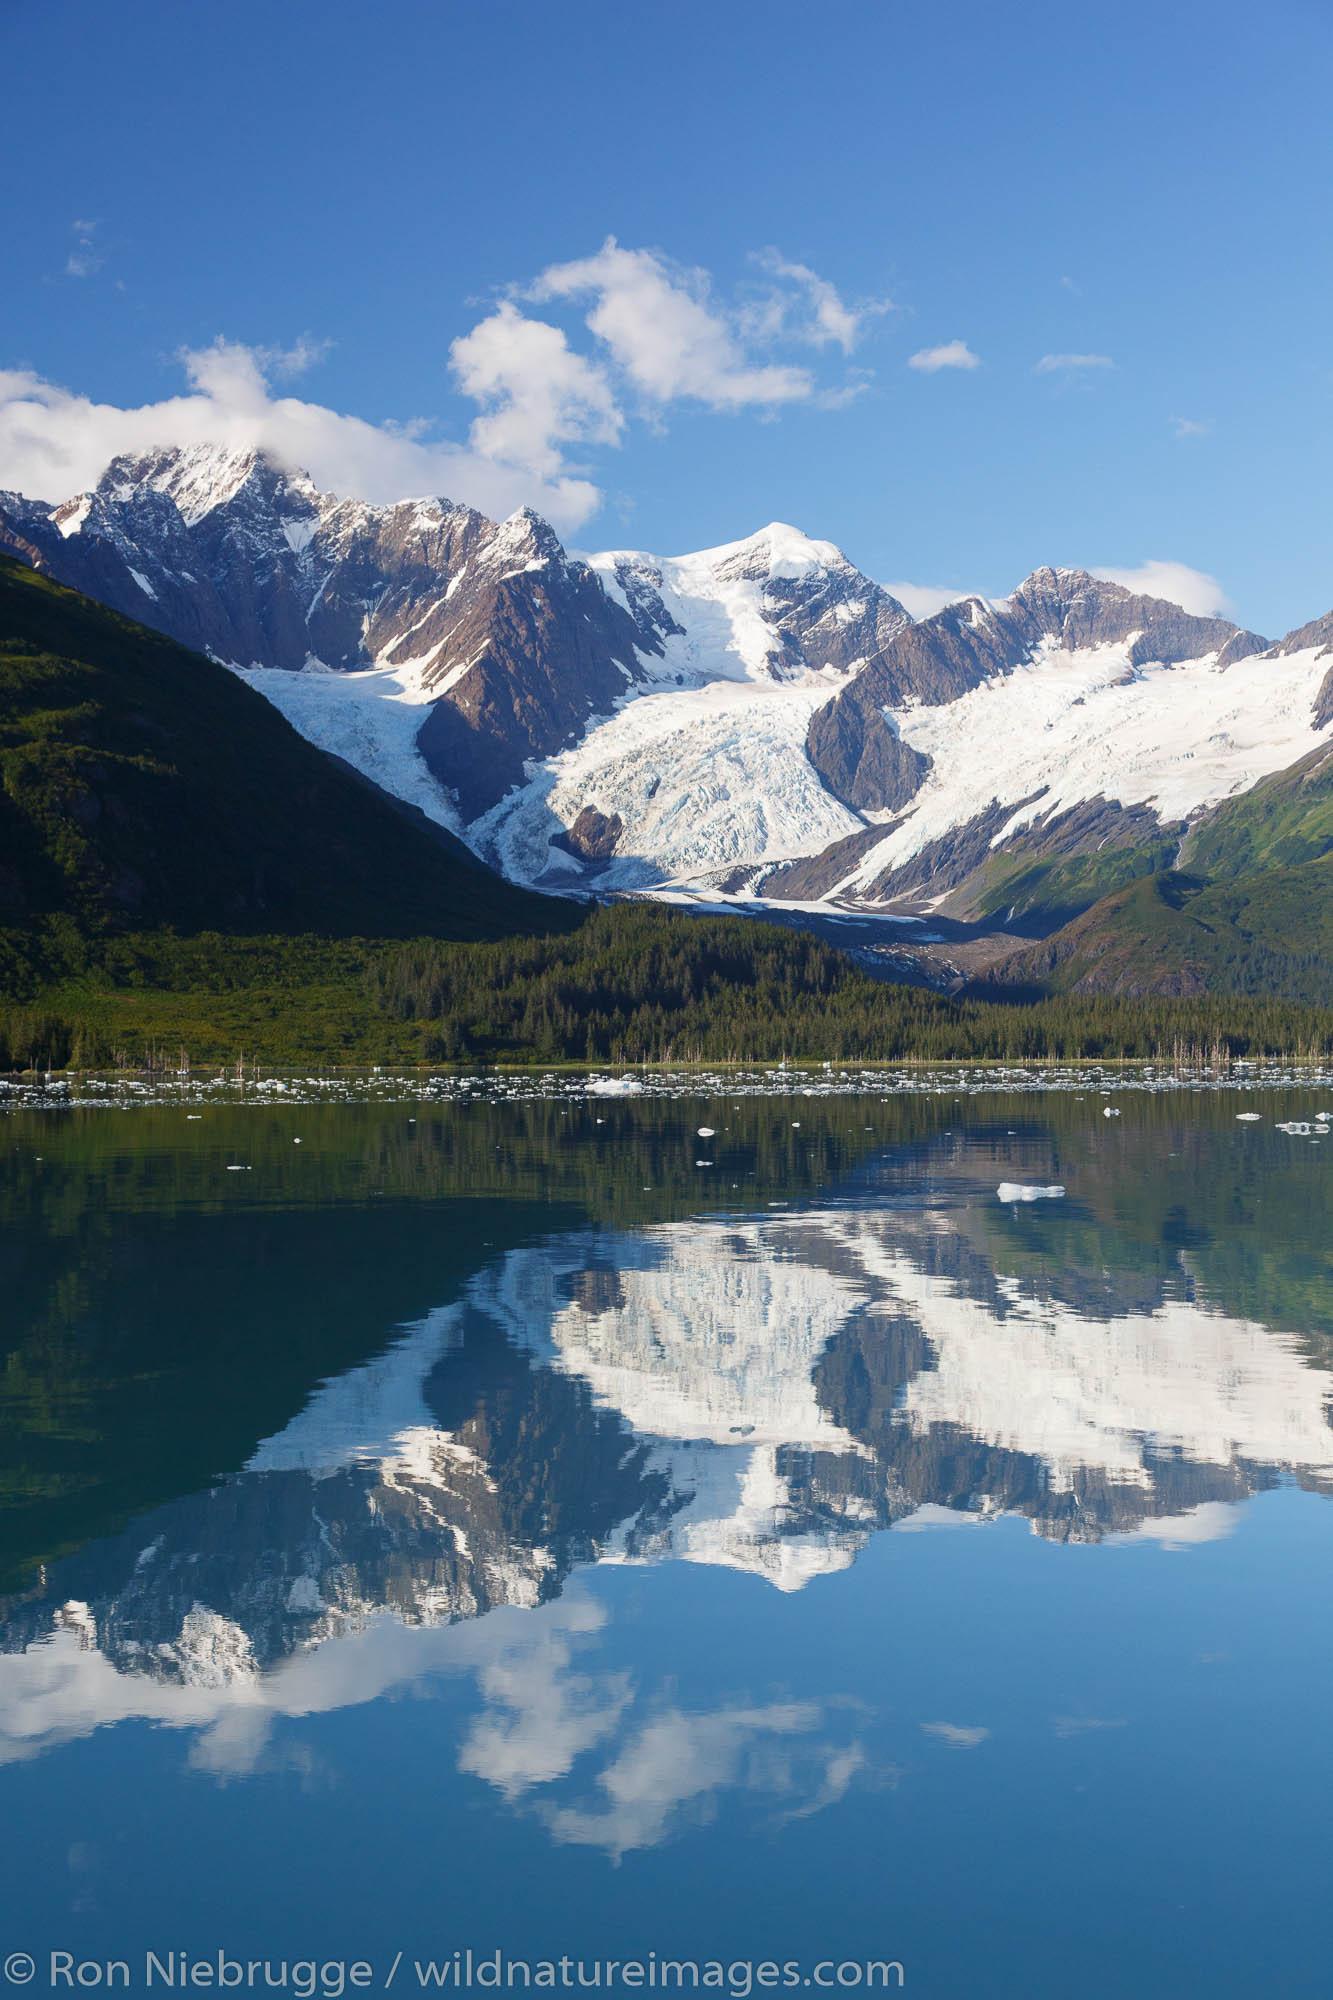 Harriman Fjord, Prince William Sound, Chugach National Forest, Alaska.